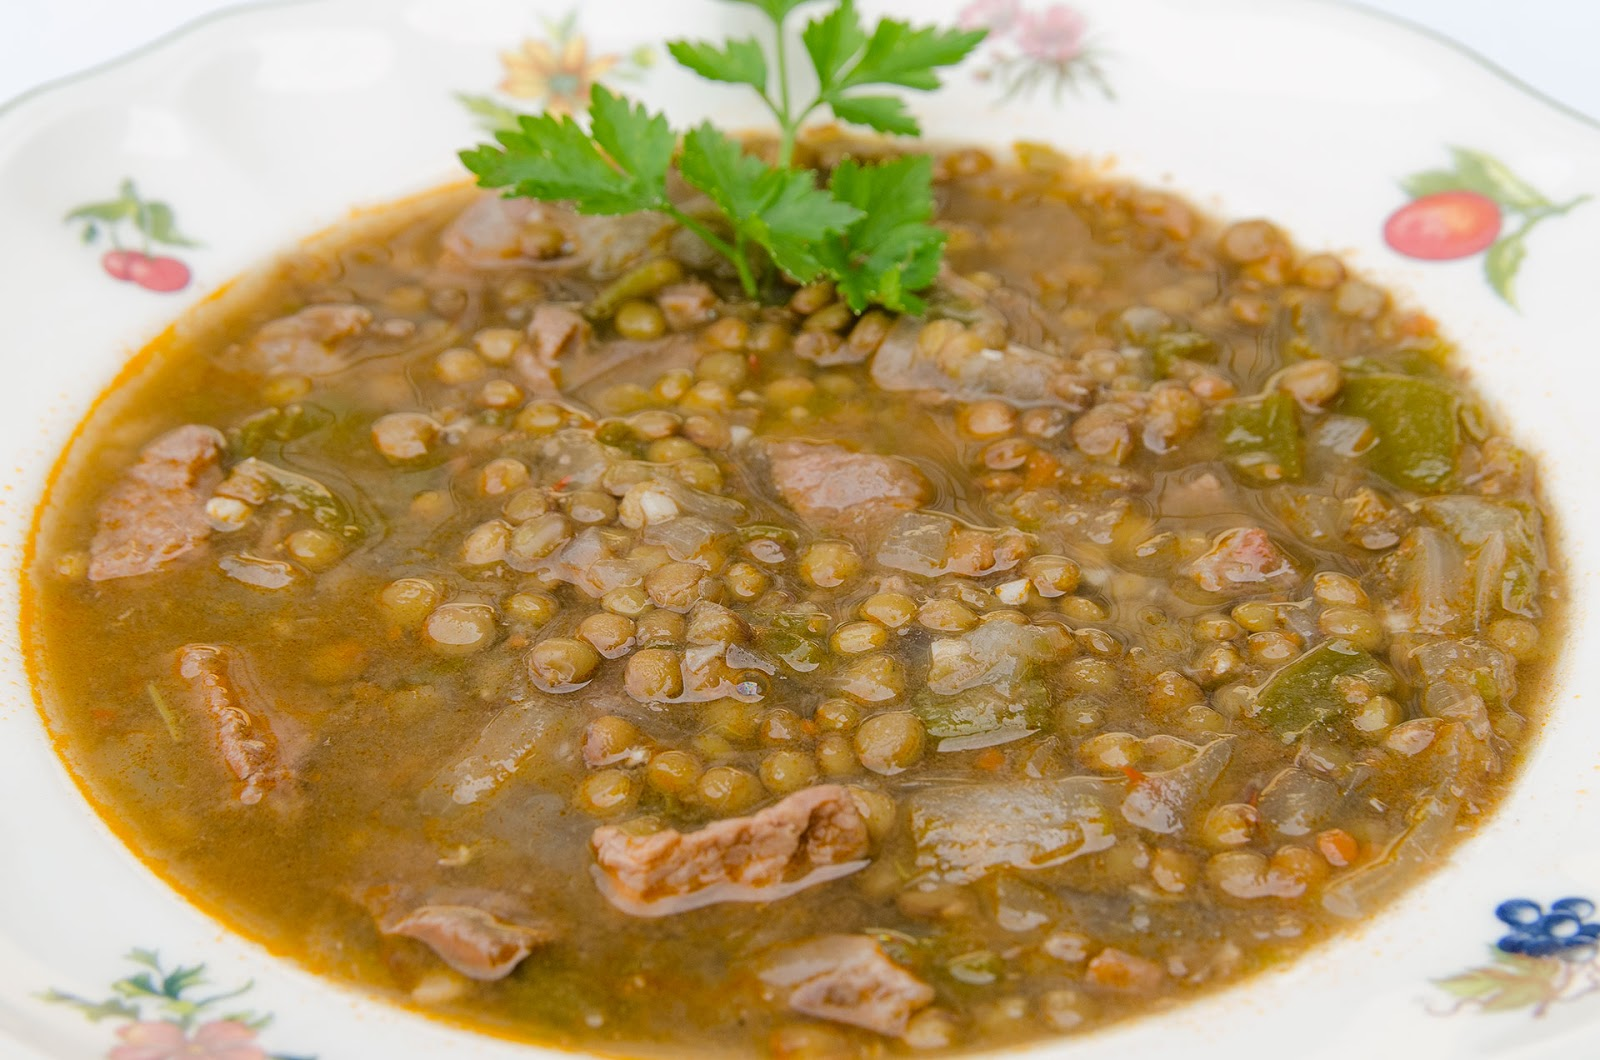 receta-lentejas-ligeras-cocina-tradicional-facil-no-engorda-grasa-bruja